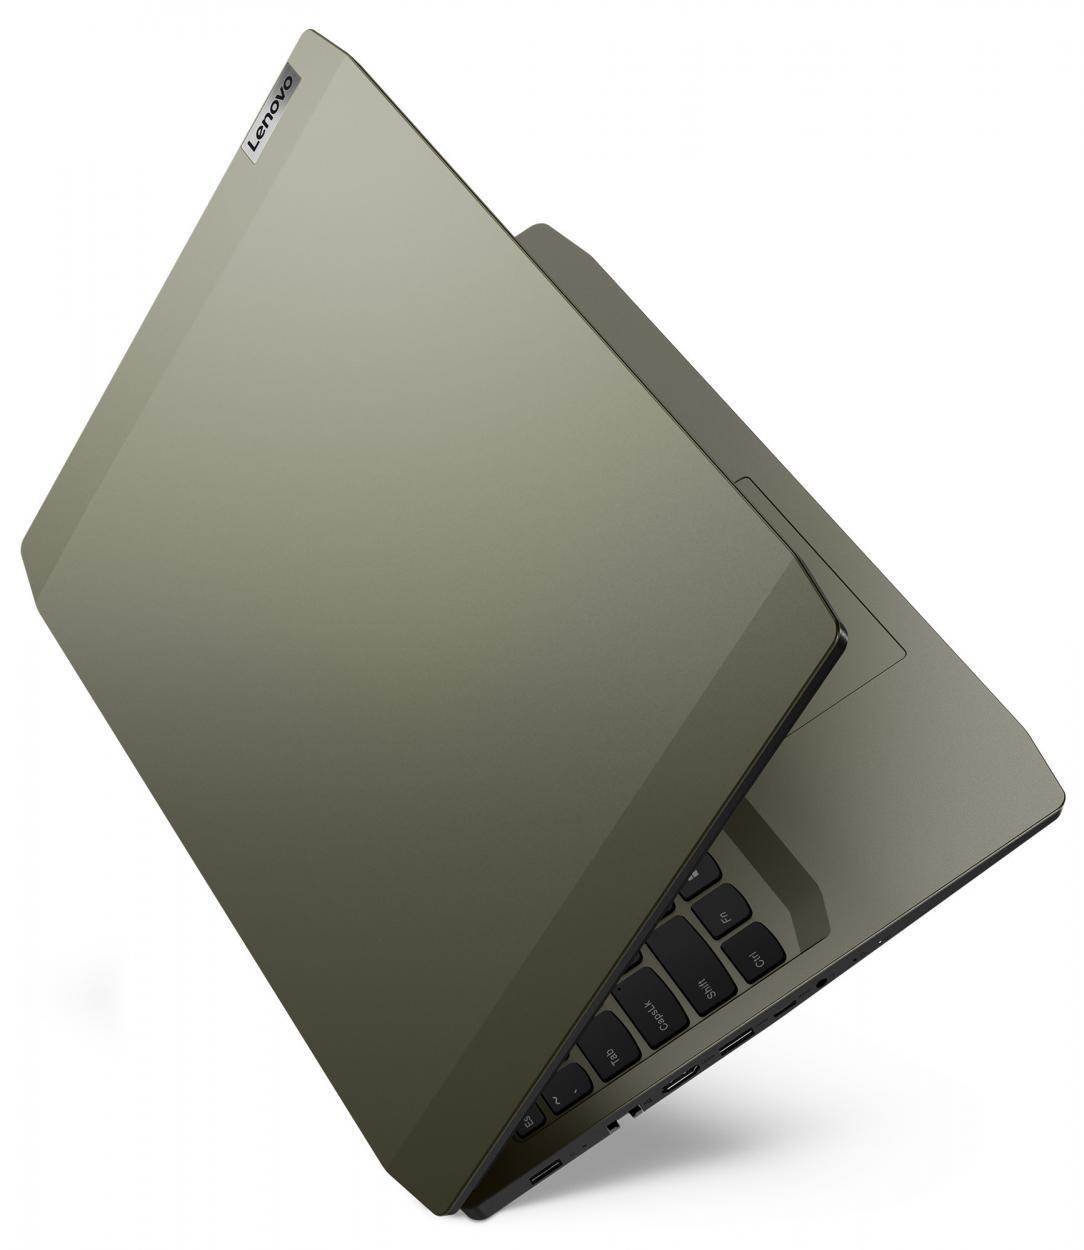 Ordinateur portable Lenovo  IdeaPad Creator 5 15IMH05 (82D4004WFR) Vert Kaki - GTX 1650 Ti, 144Hz - photo 9